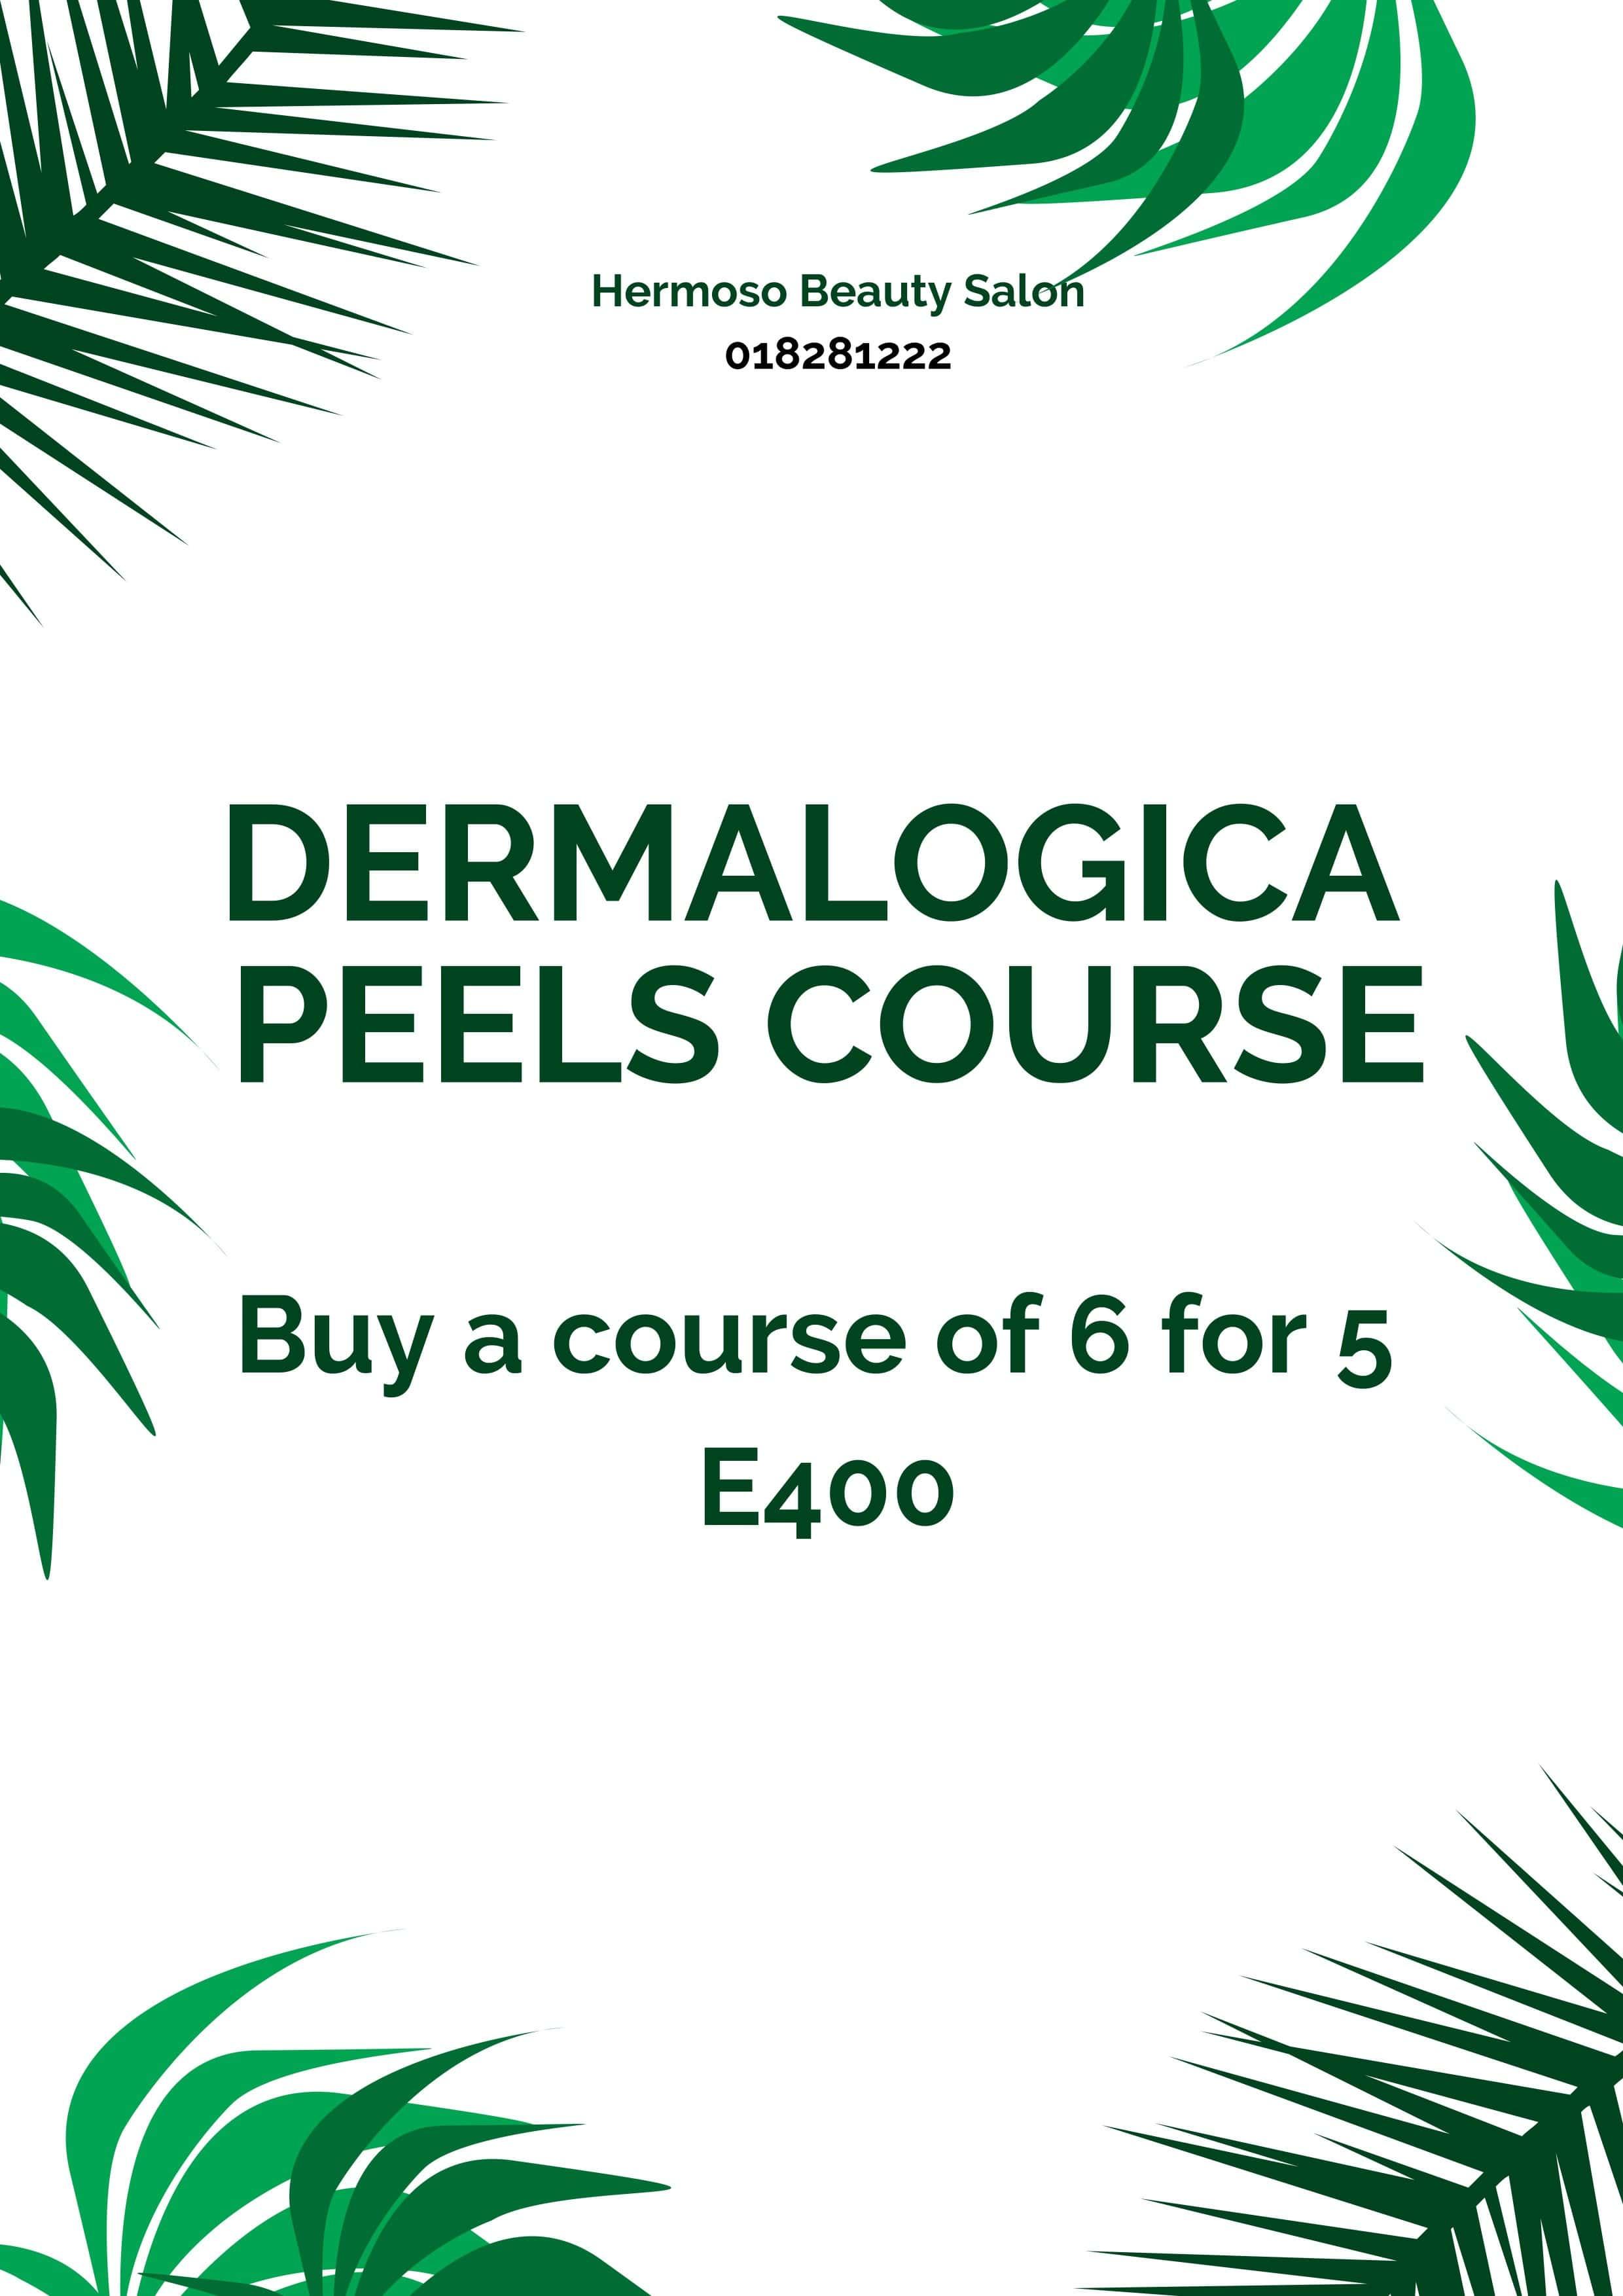 Offer - Dermalogica Peels Course